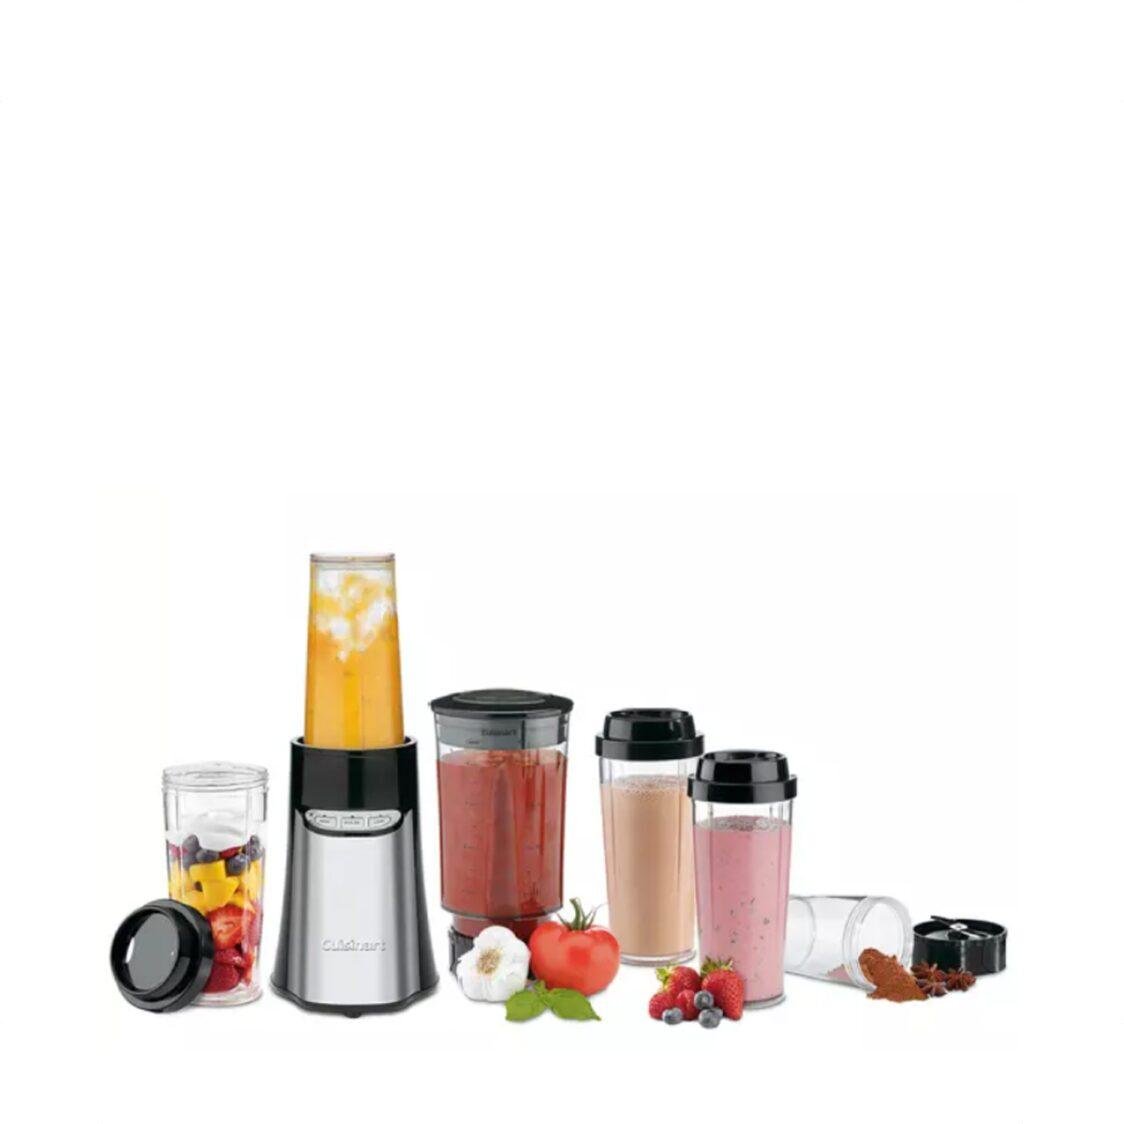 Cuisinart Compact Portable BlendingChopping System